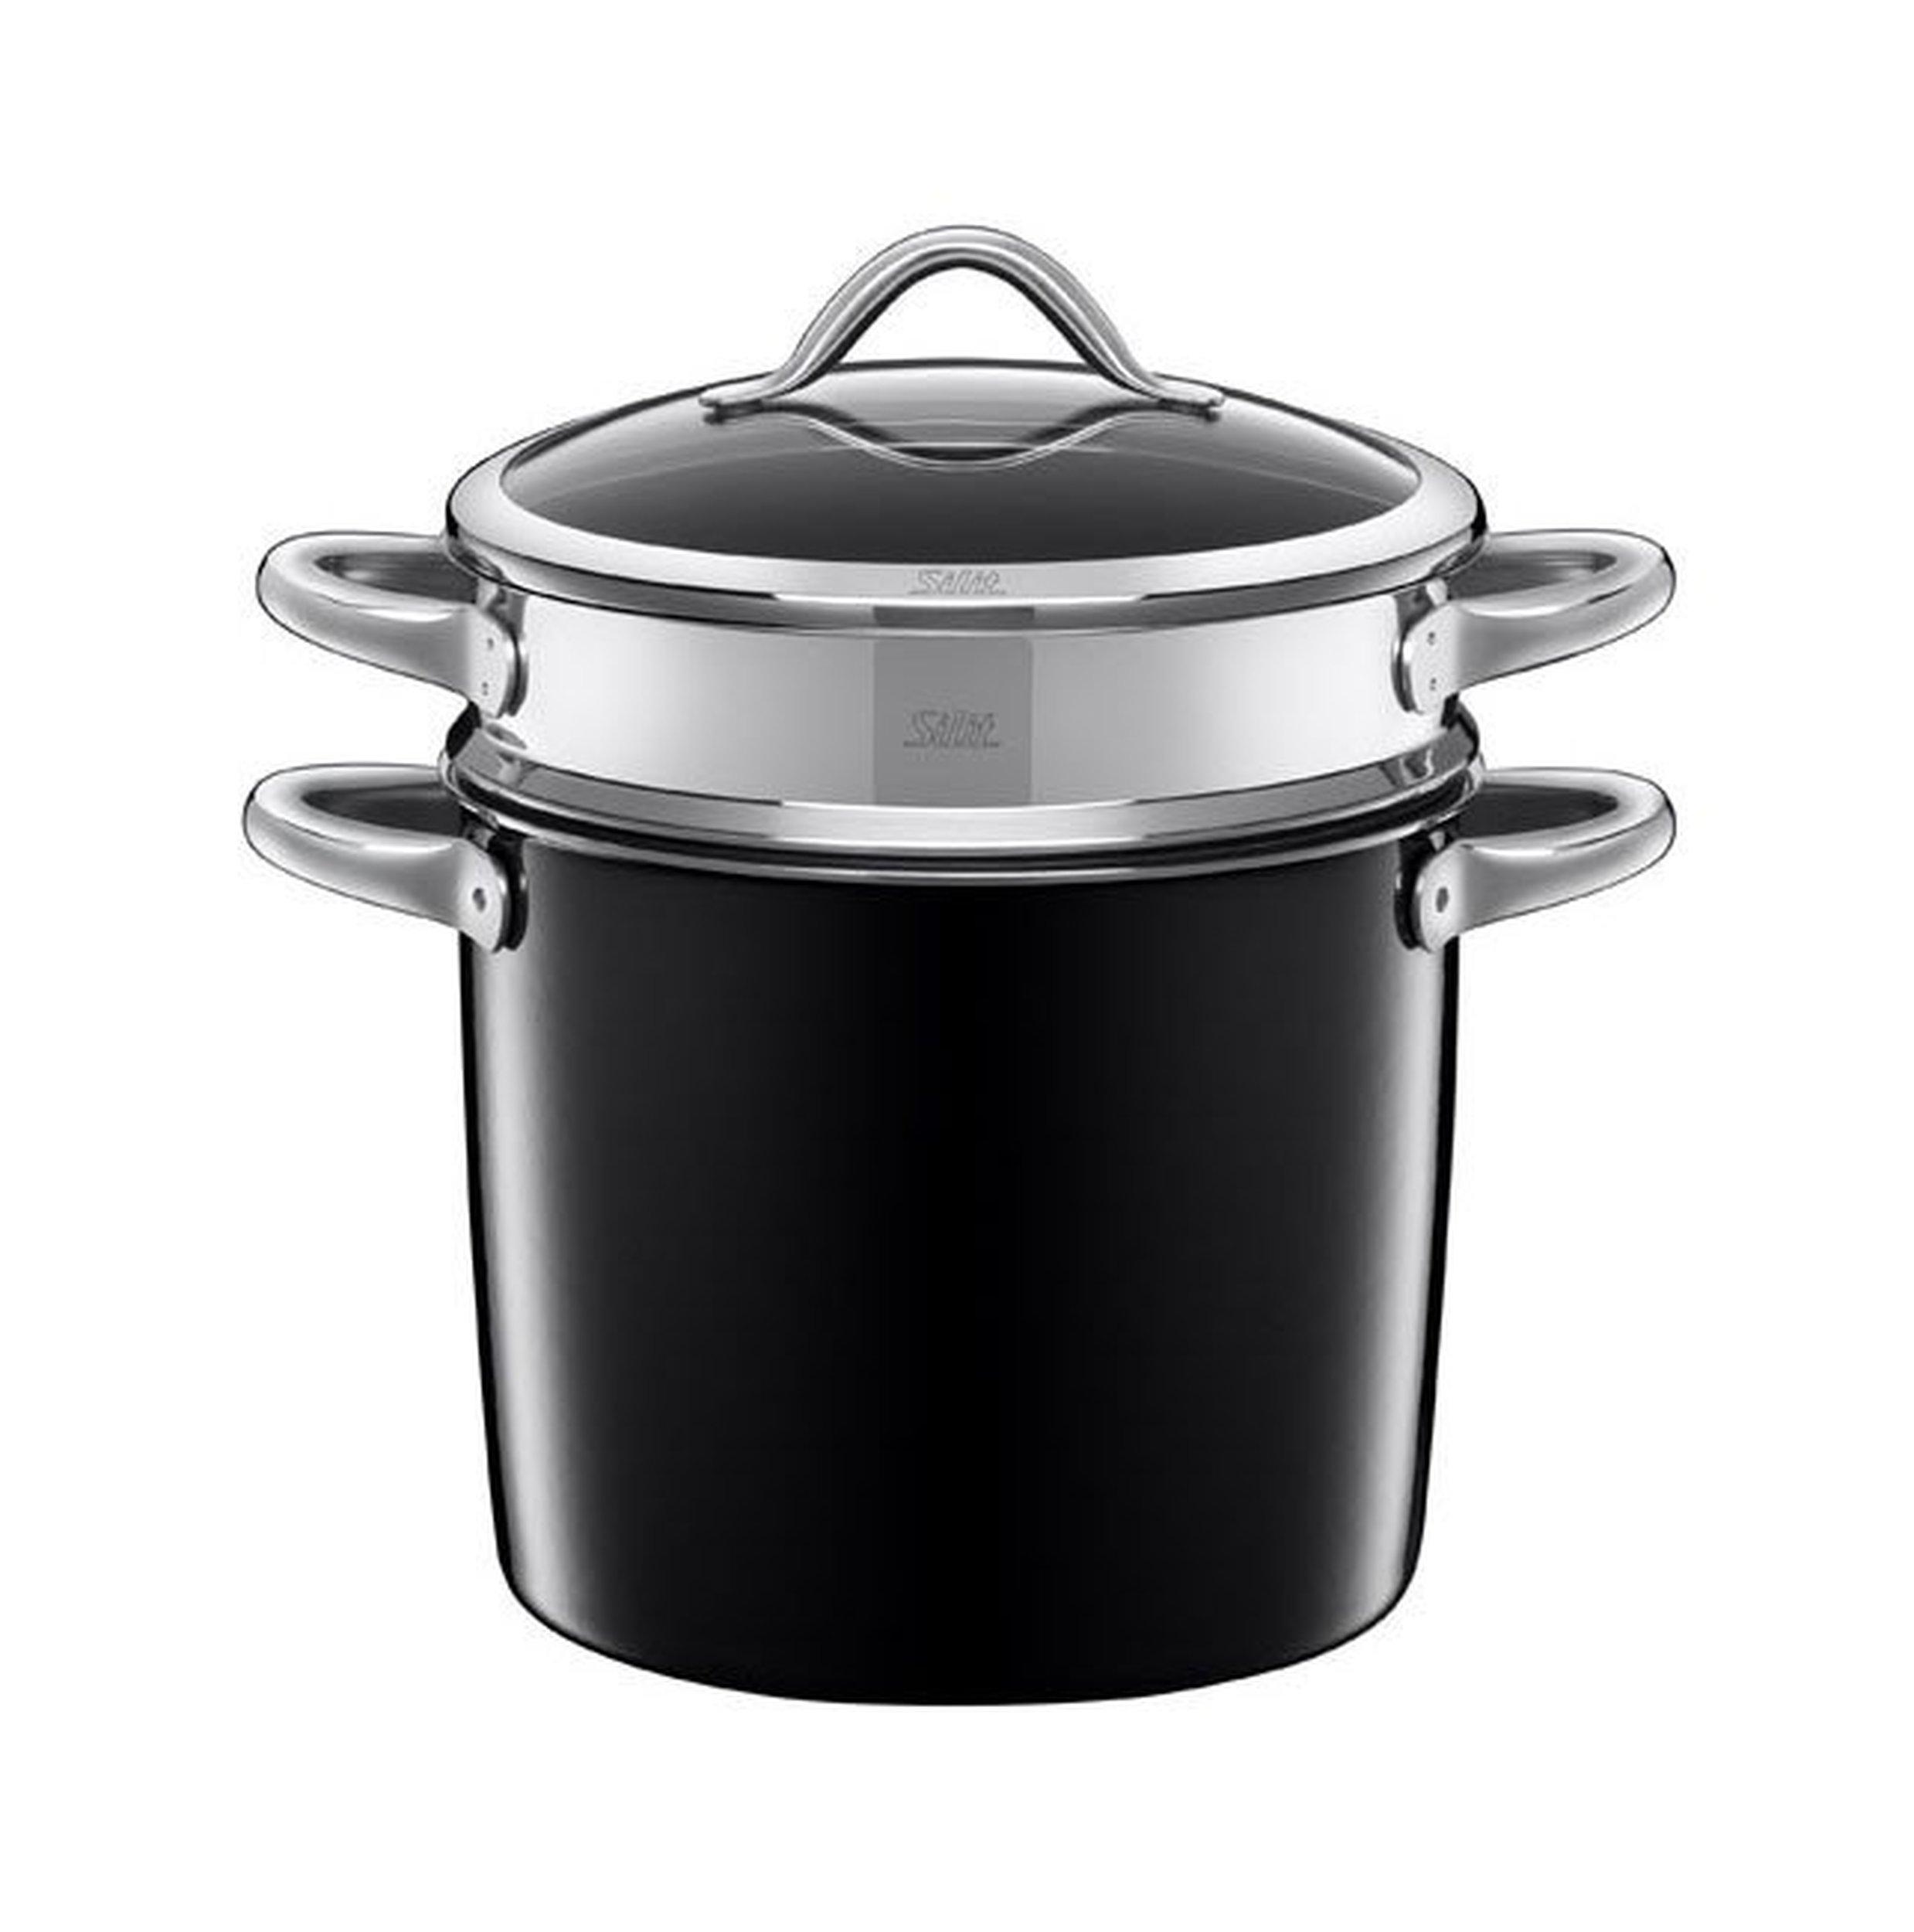 garnek do gotowania makaronu vitaliano nero silit. Black Bedroom Furniture Sets. Home Design Ideas